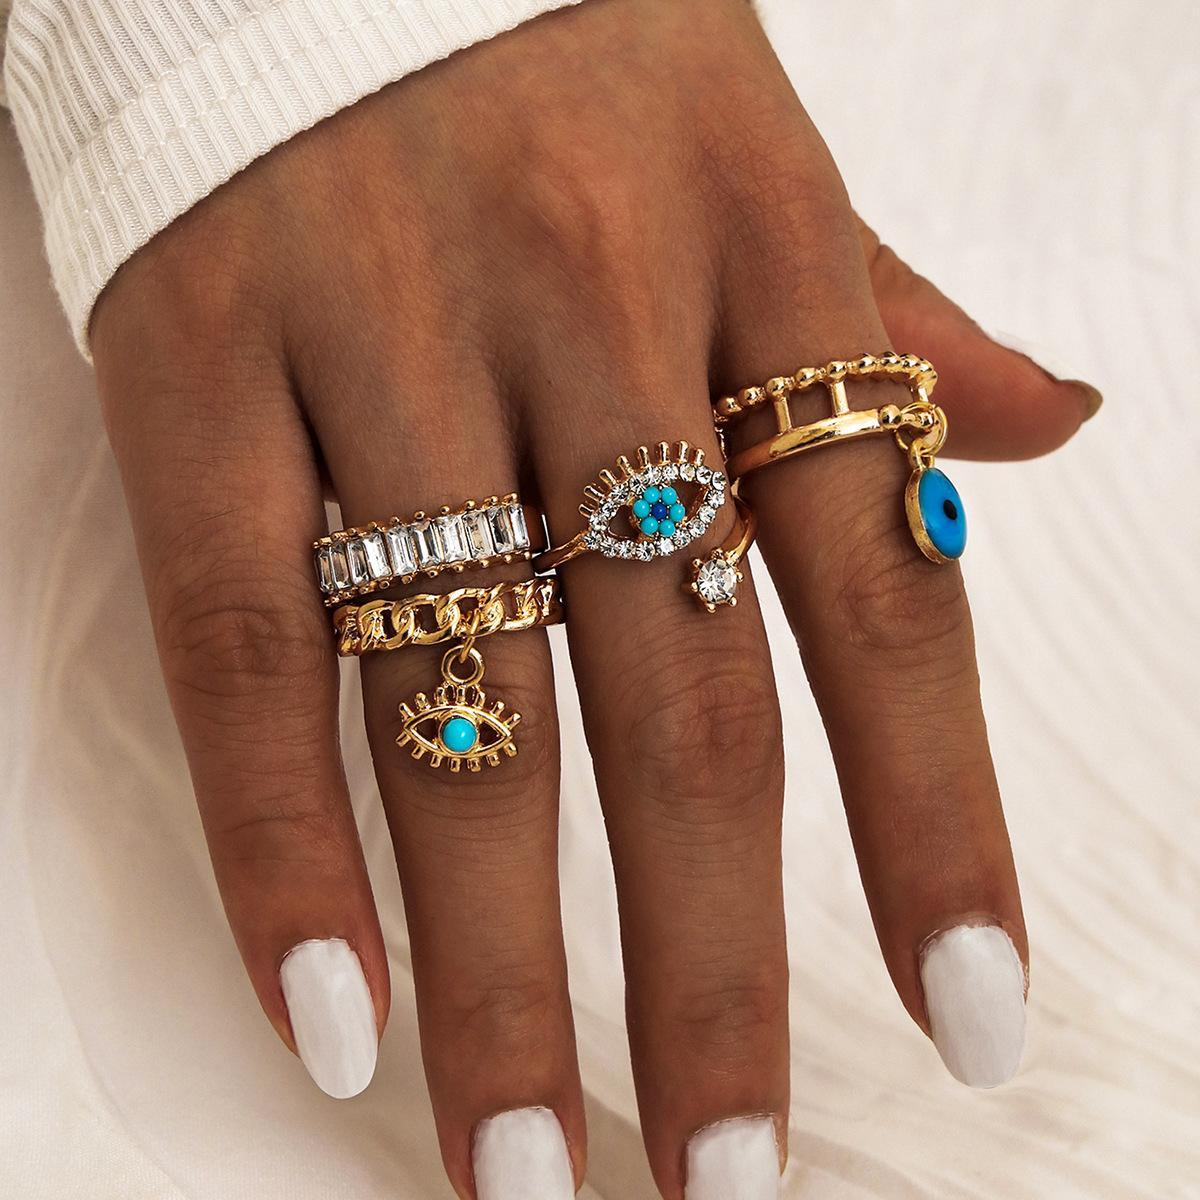 4pcs/set New Fashion Turquoise Diamond Finger Ring Women Girls 18k Glod Evil Eye Ring Jewelry Set